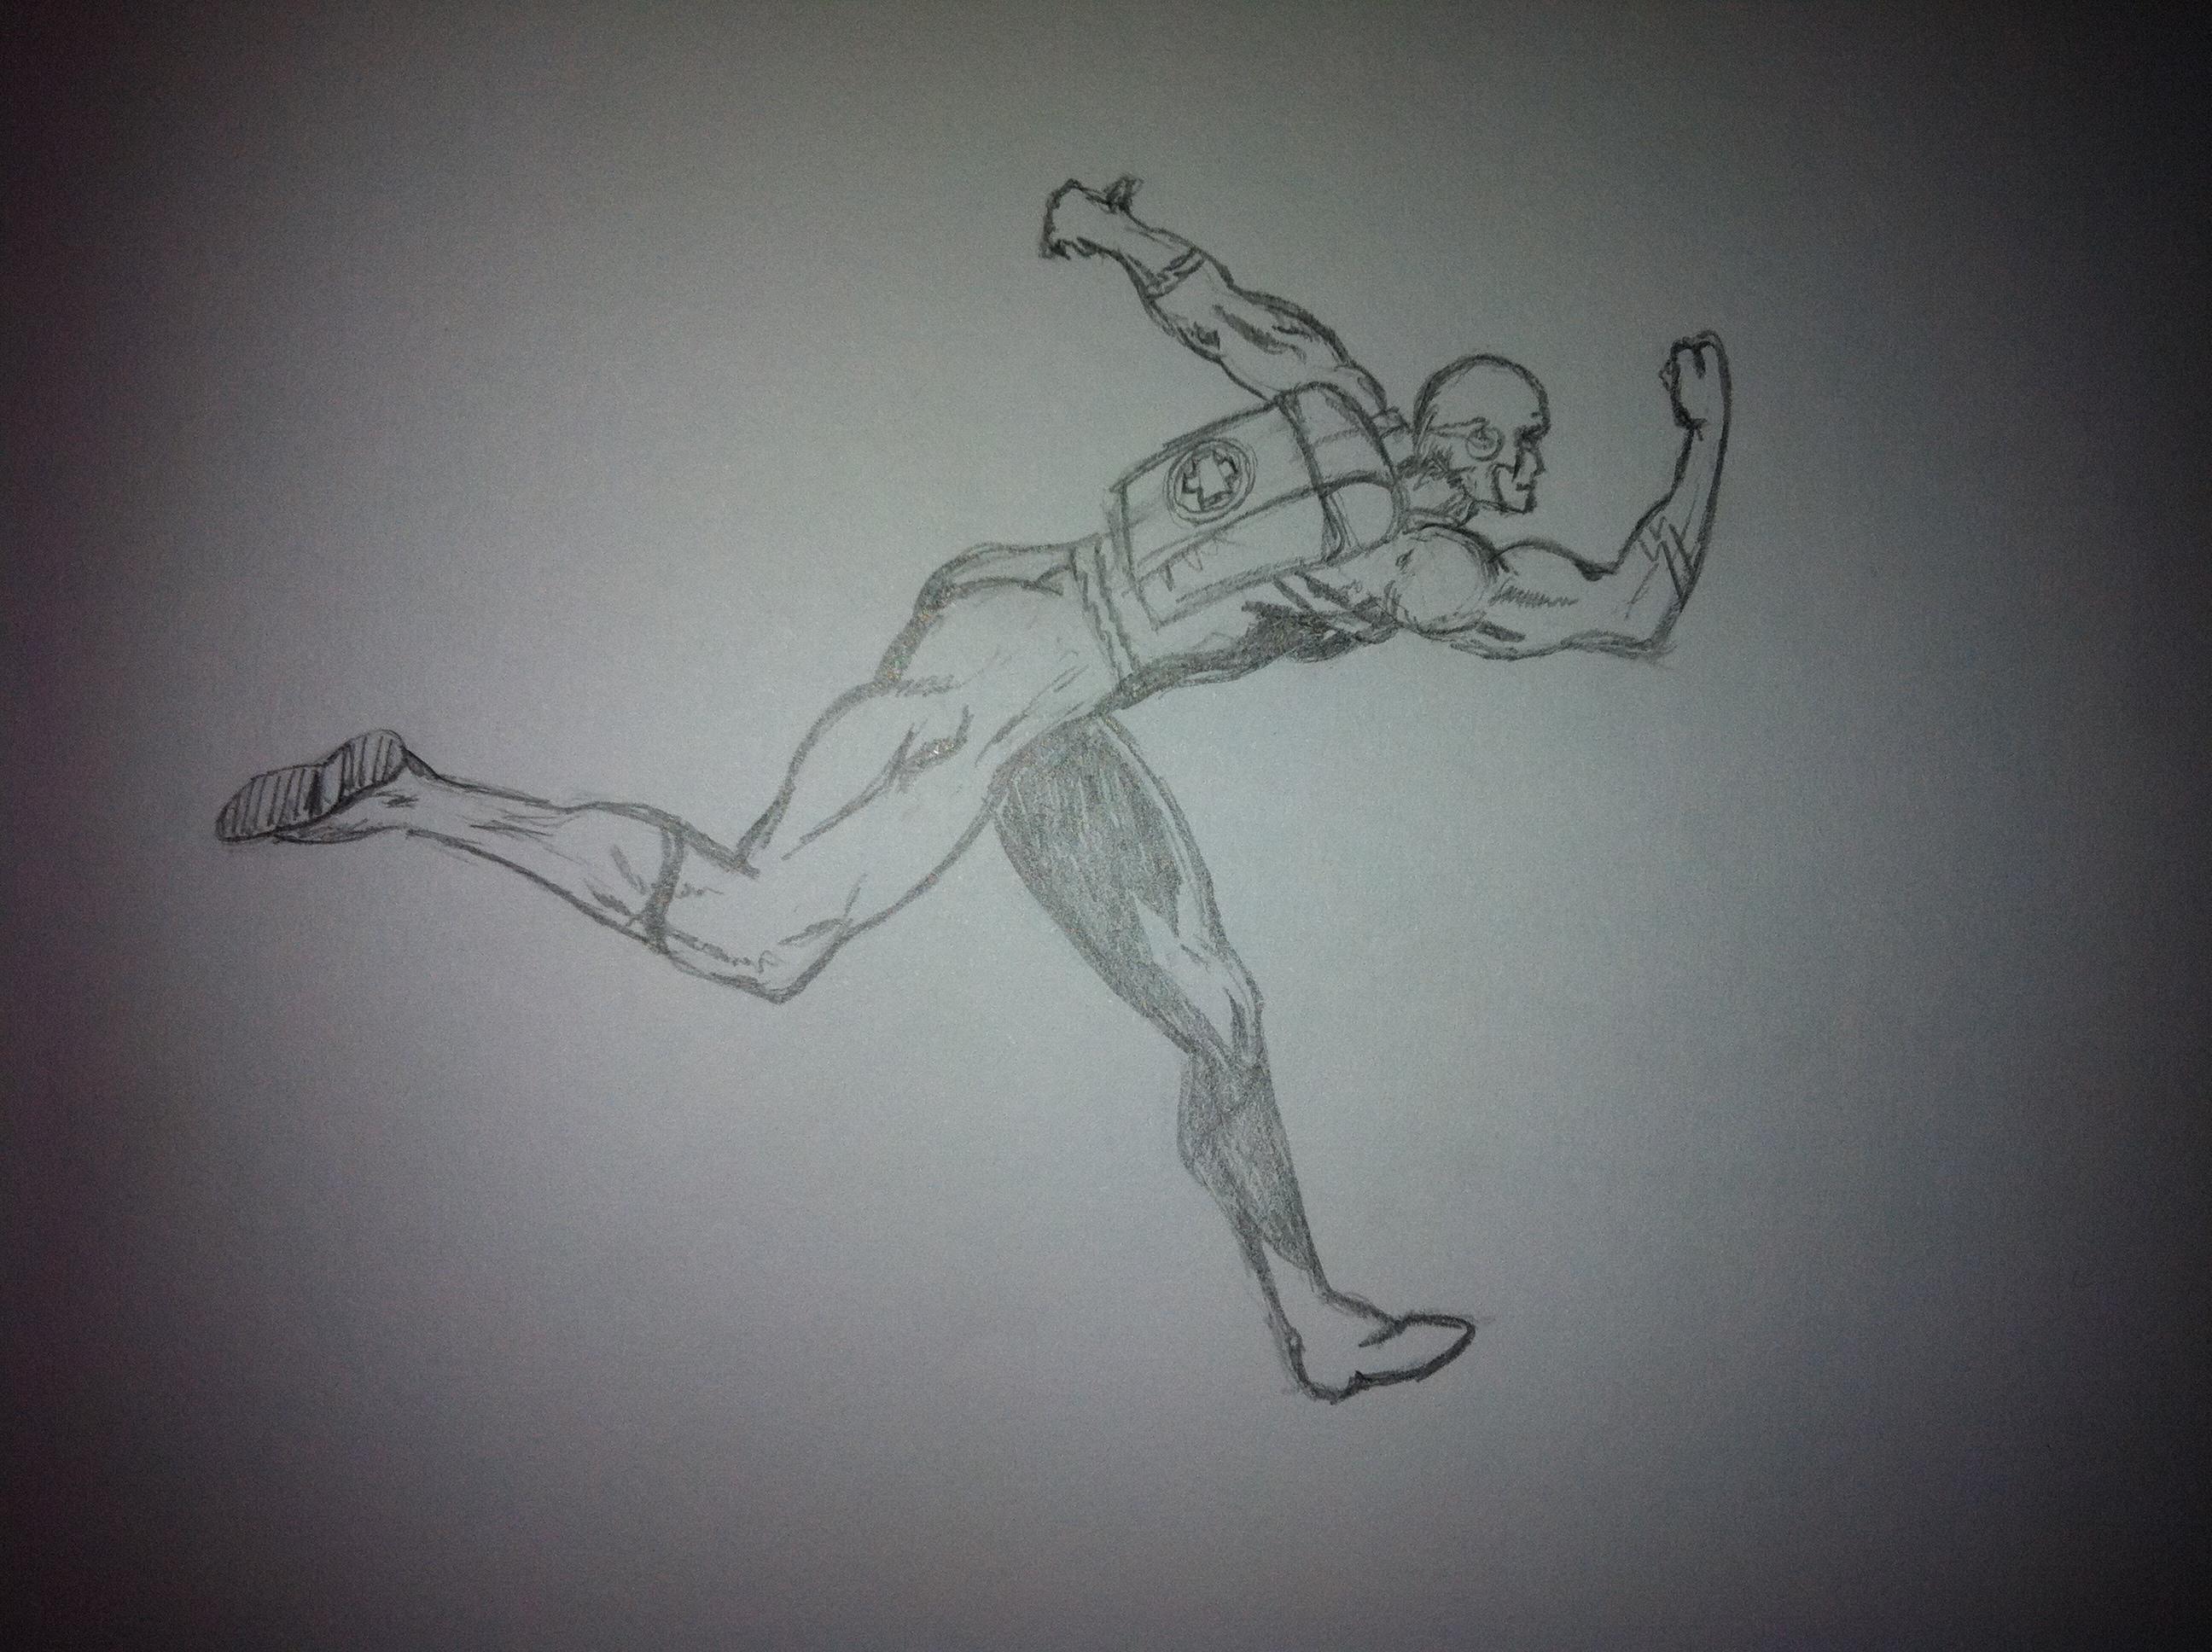 Sketch page number 1